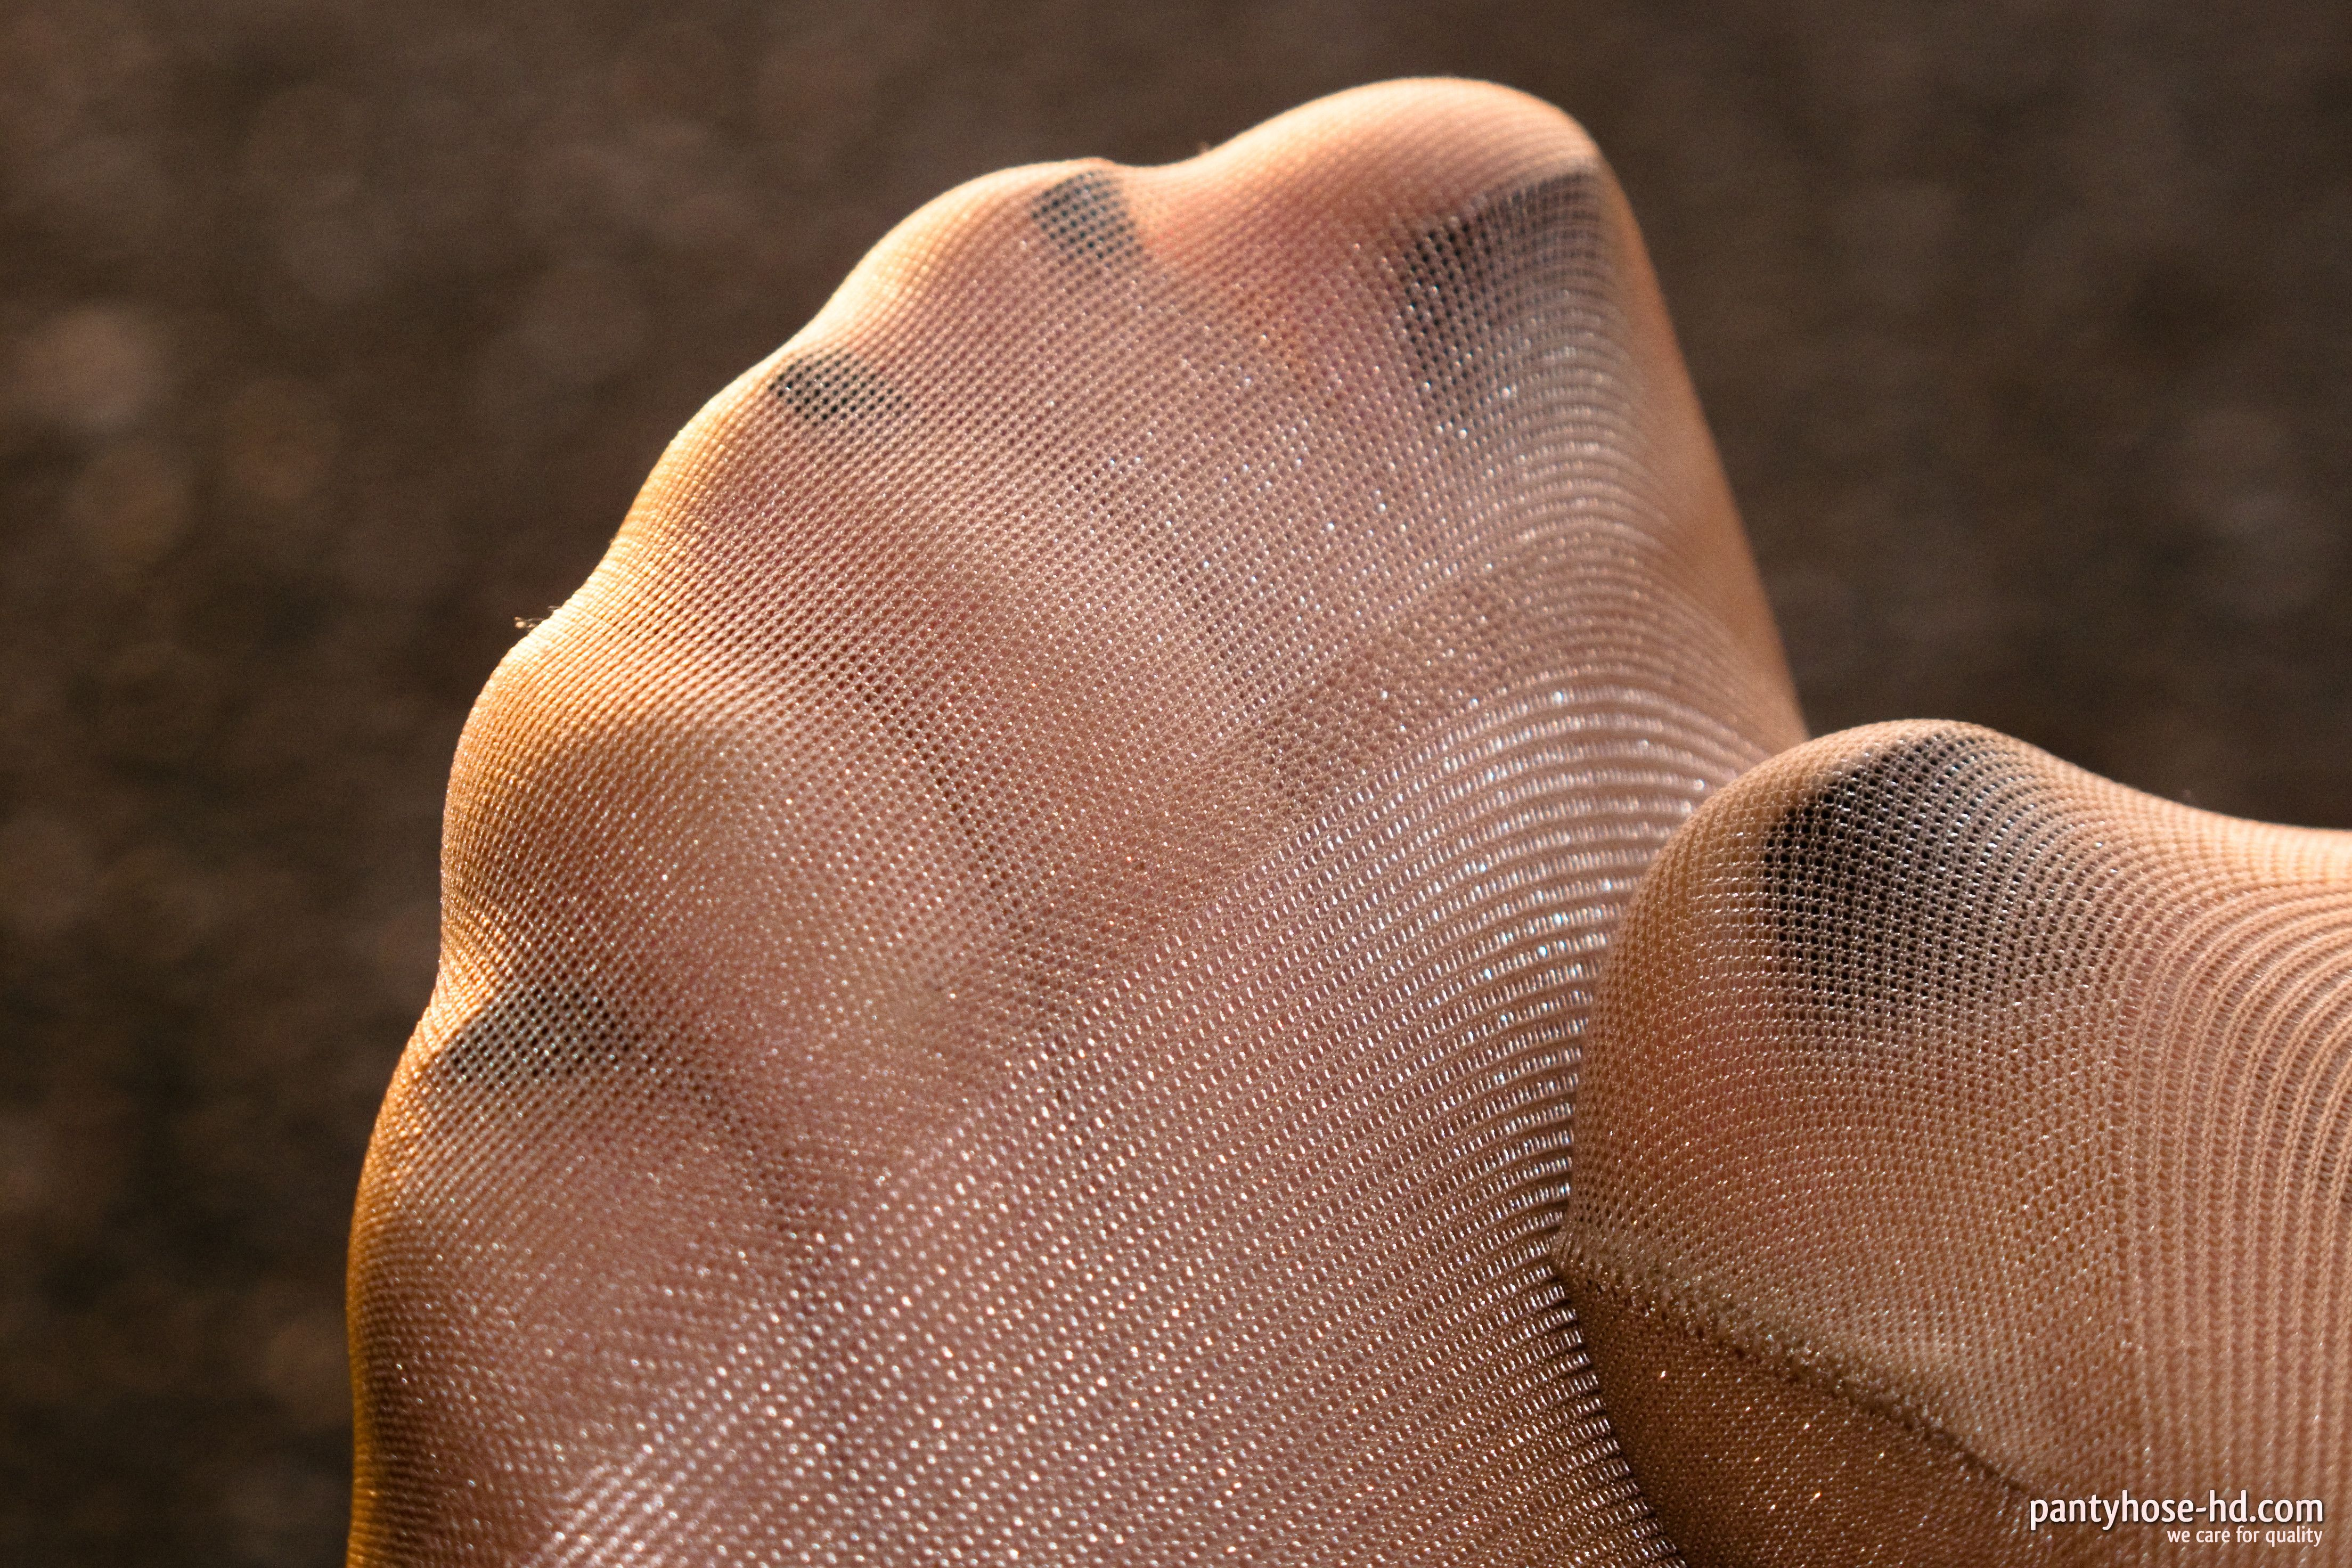 Hd pantyhose feet